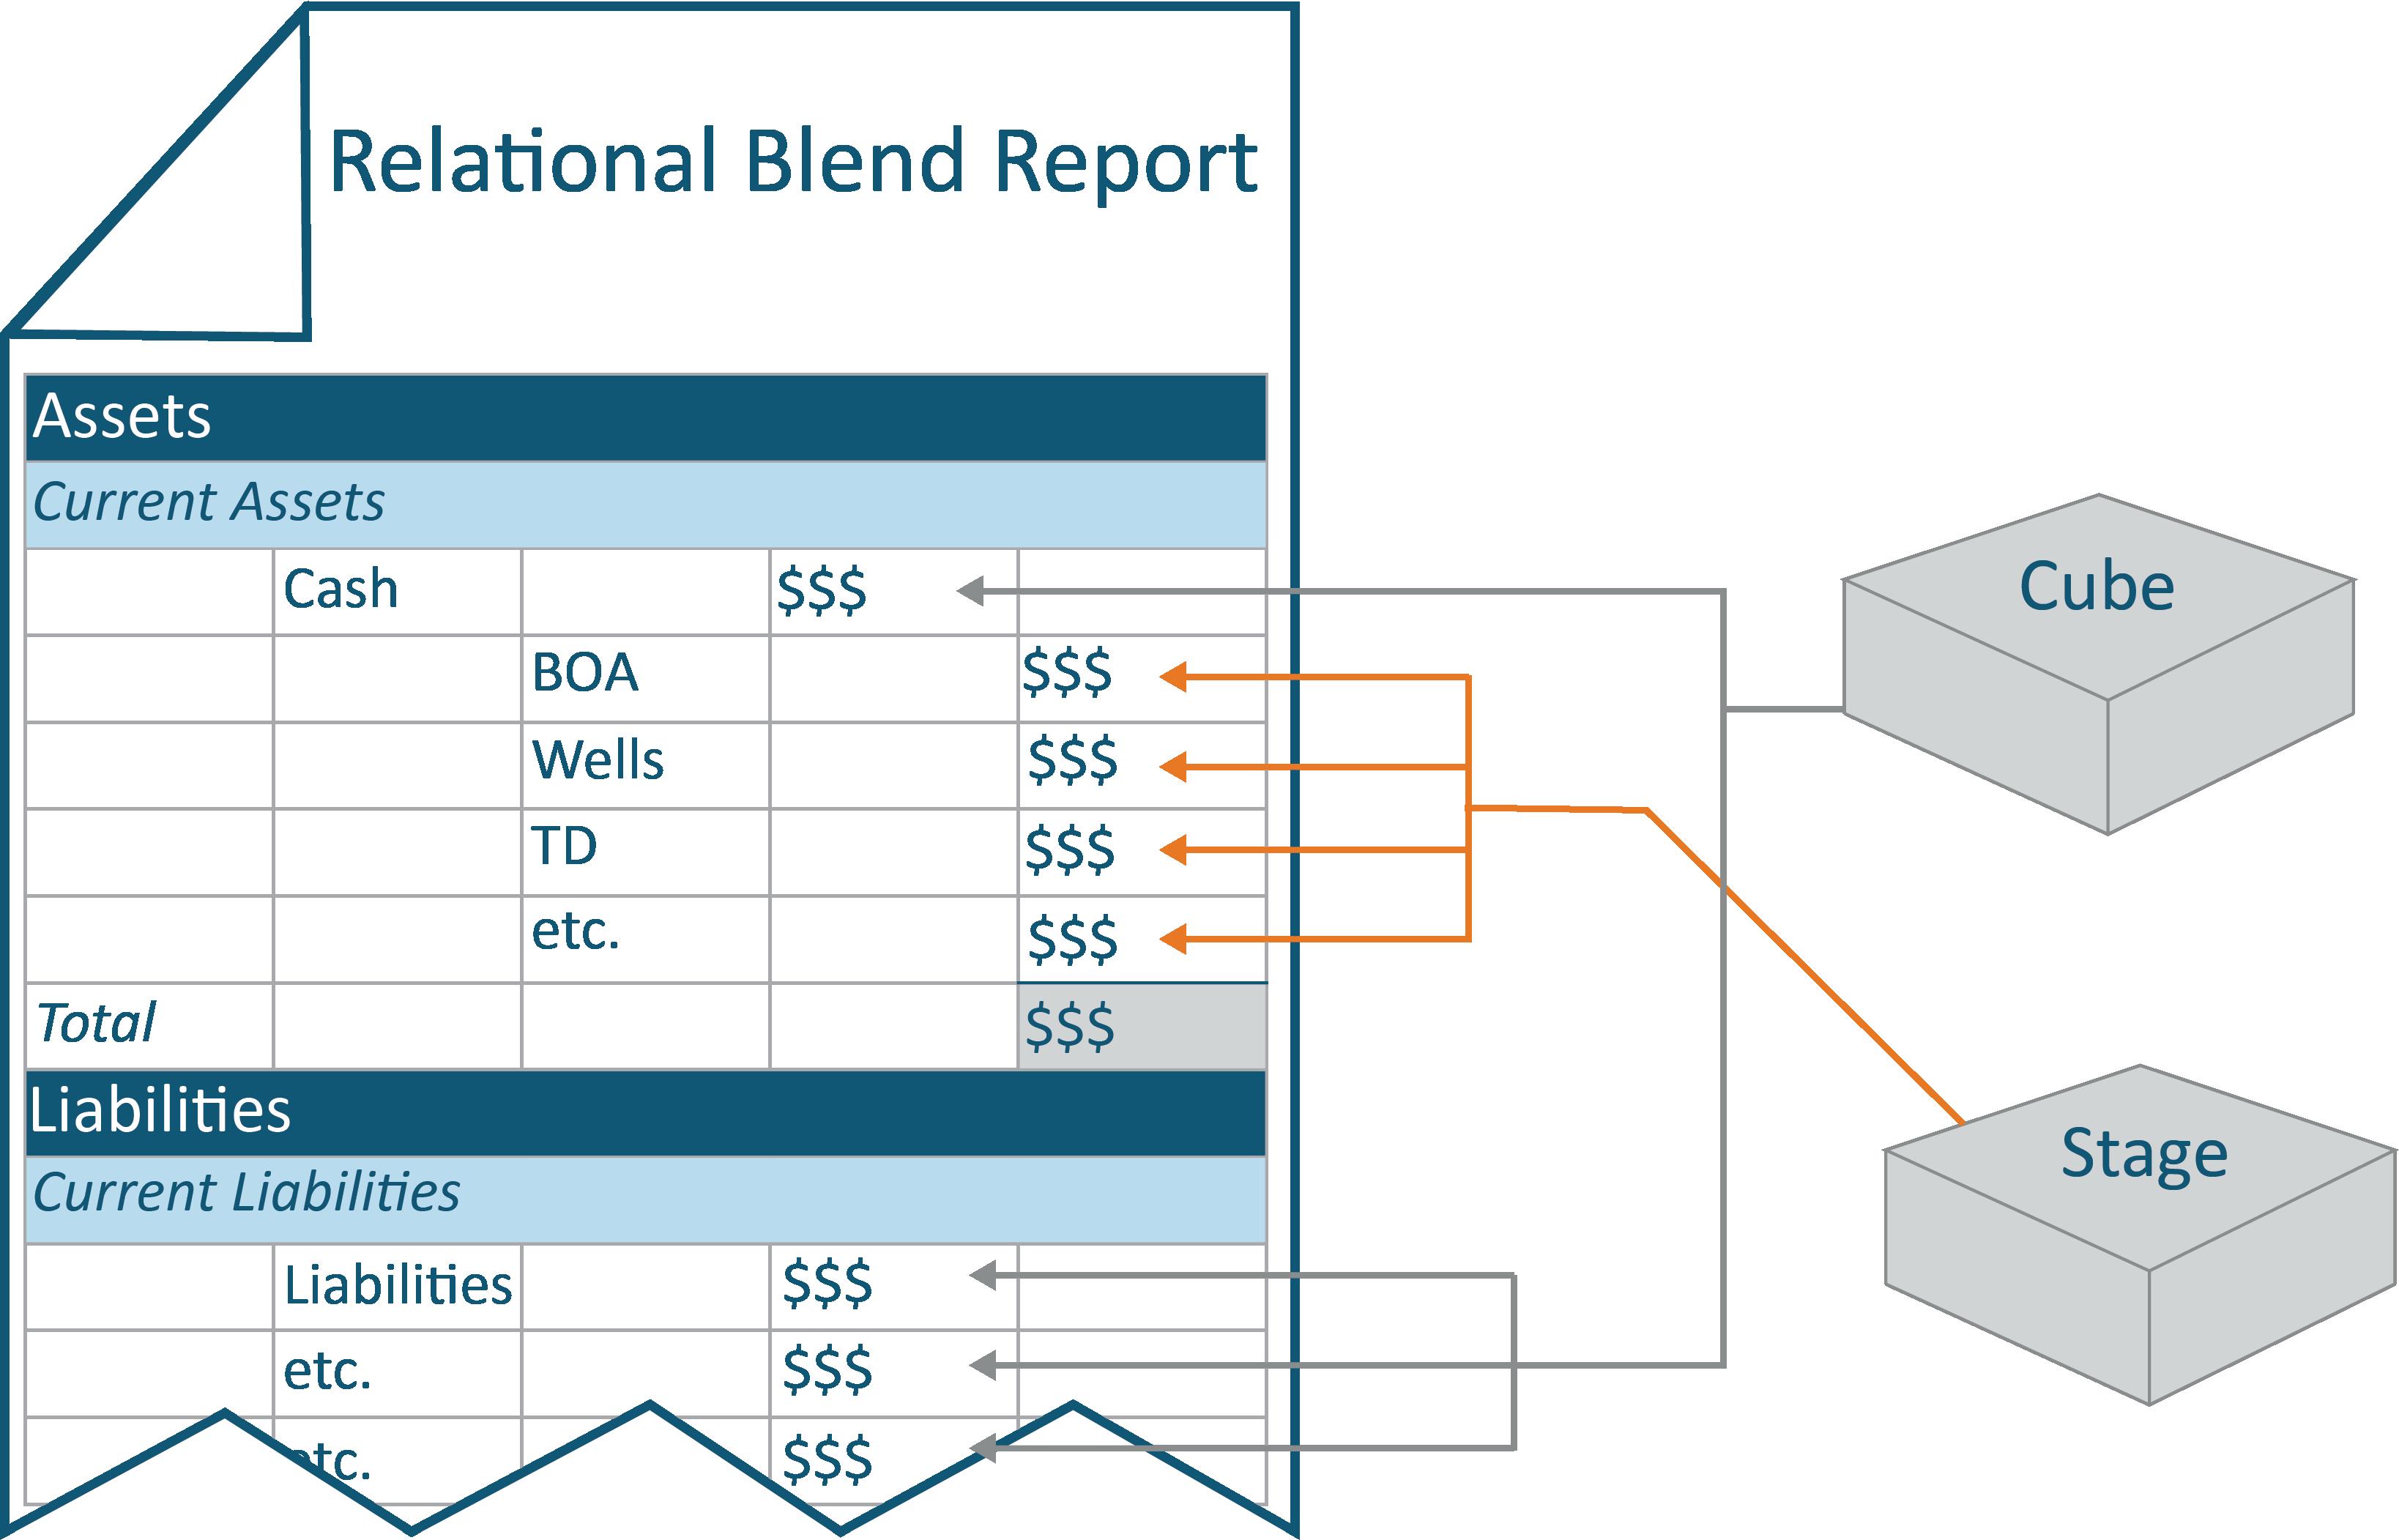 Relational Blend Report